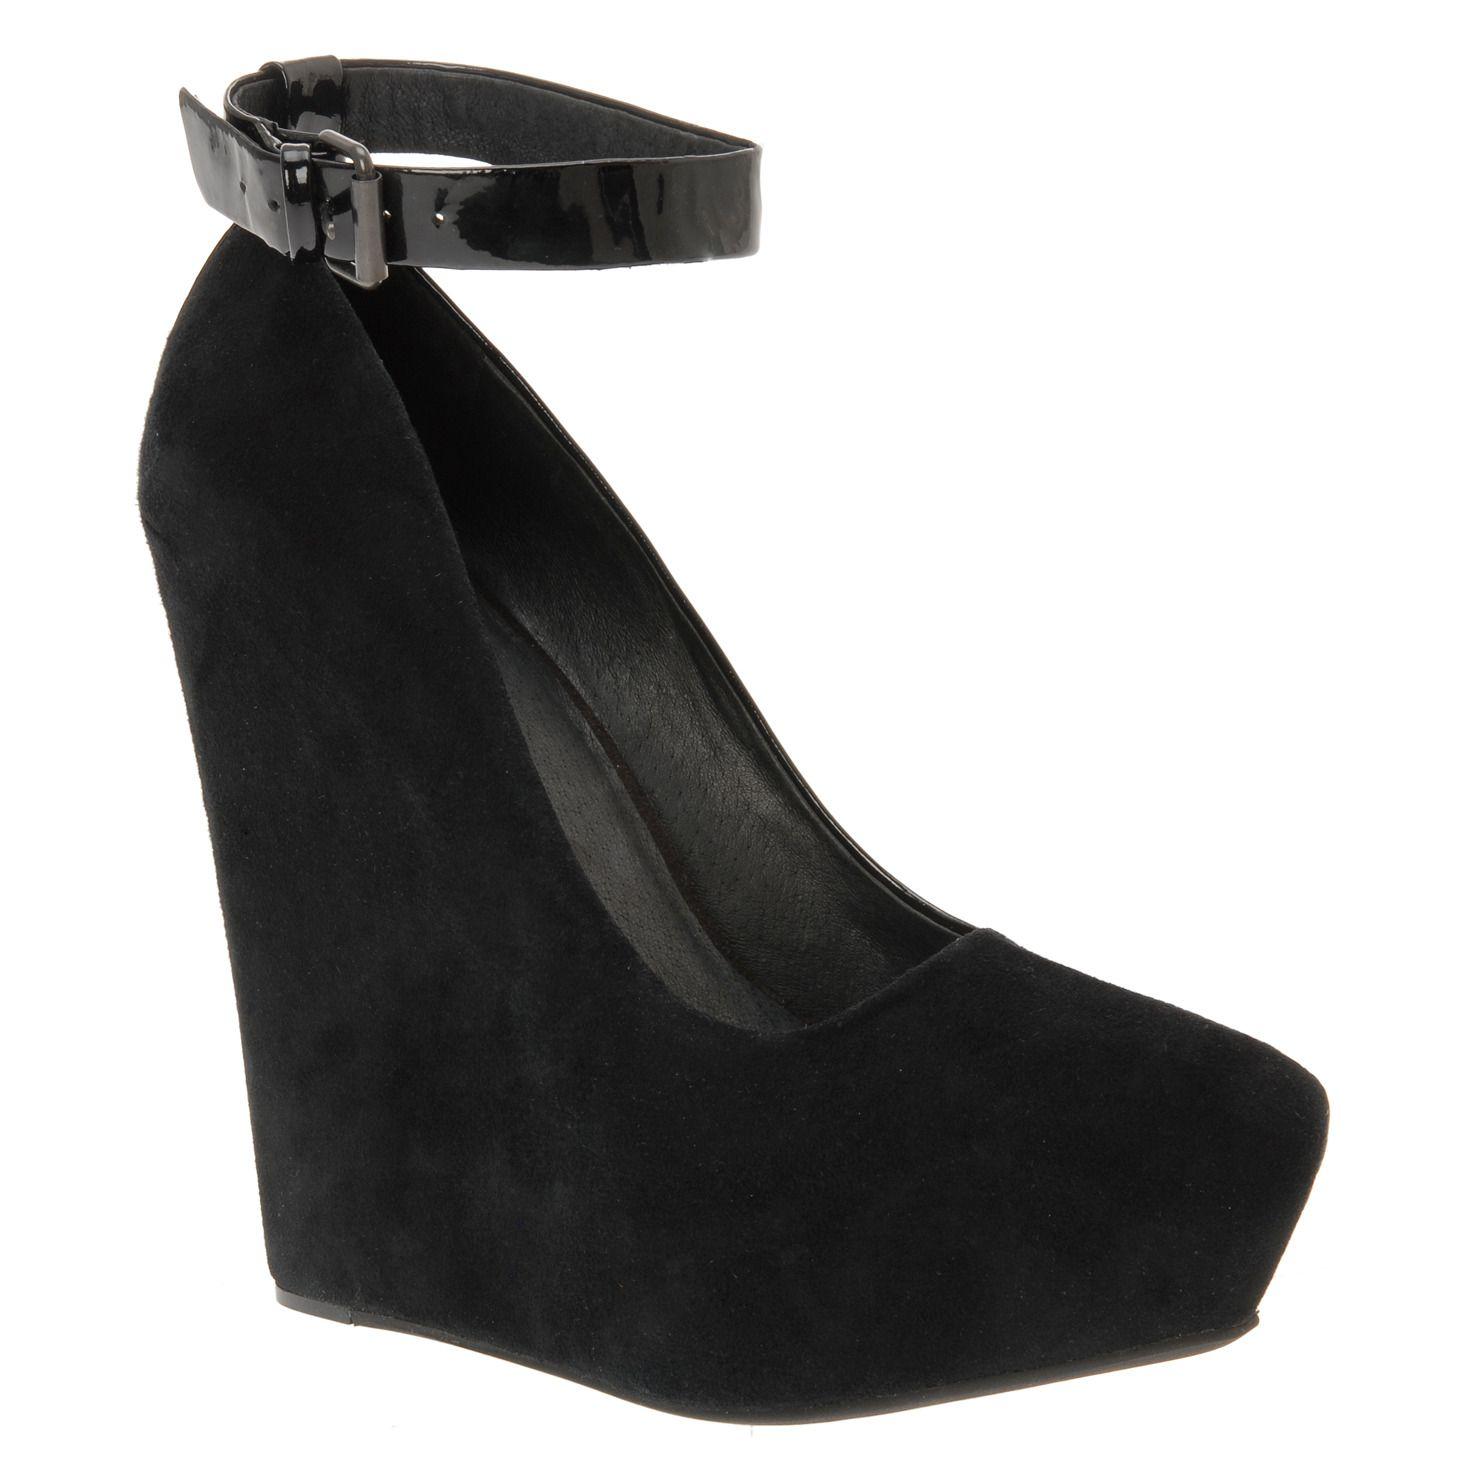 2eb9ca002fa38 Aldo Ugland Wedge Heel, $120 | Cute Wedges | Shoes, Aldo shoes ...